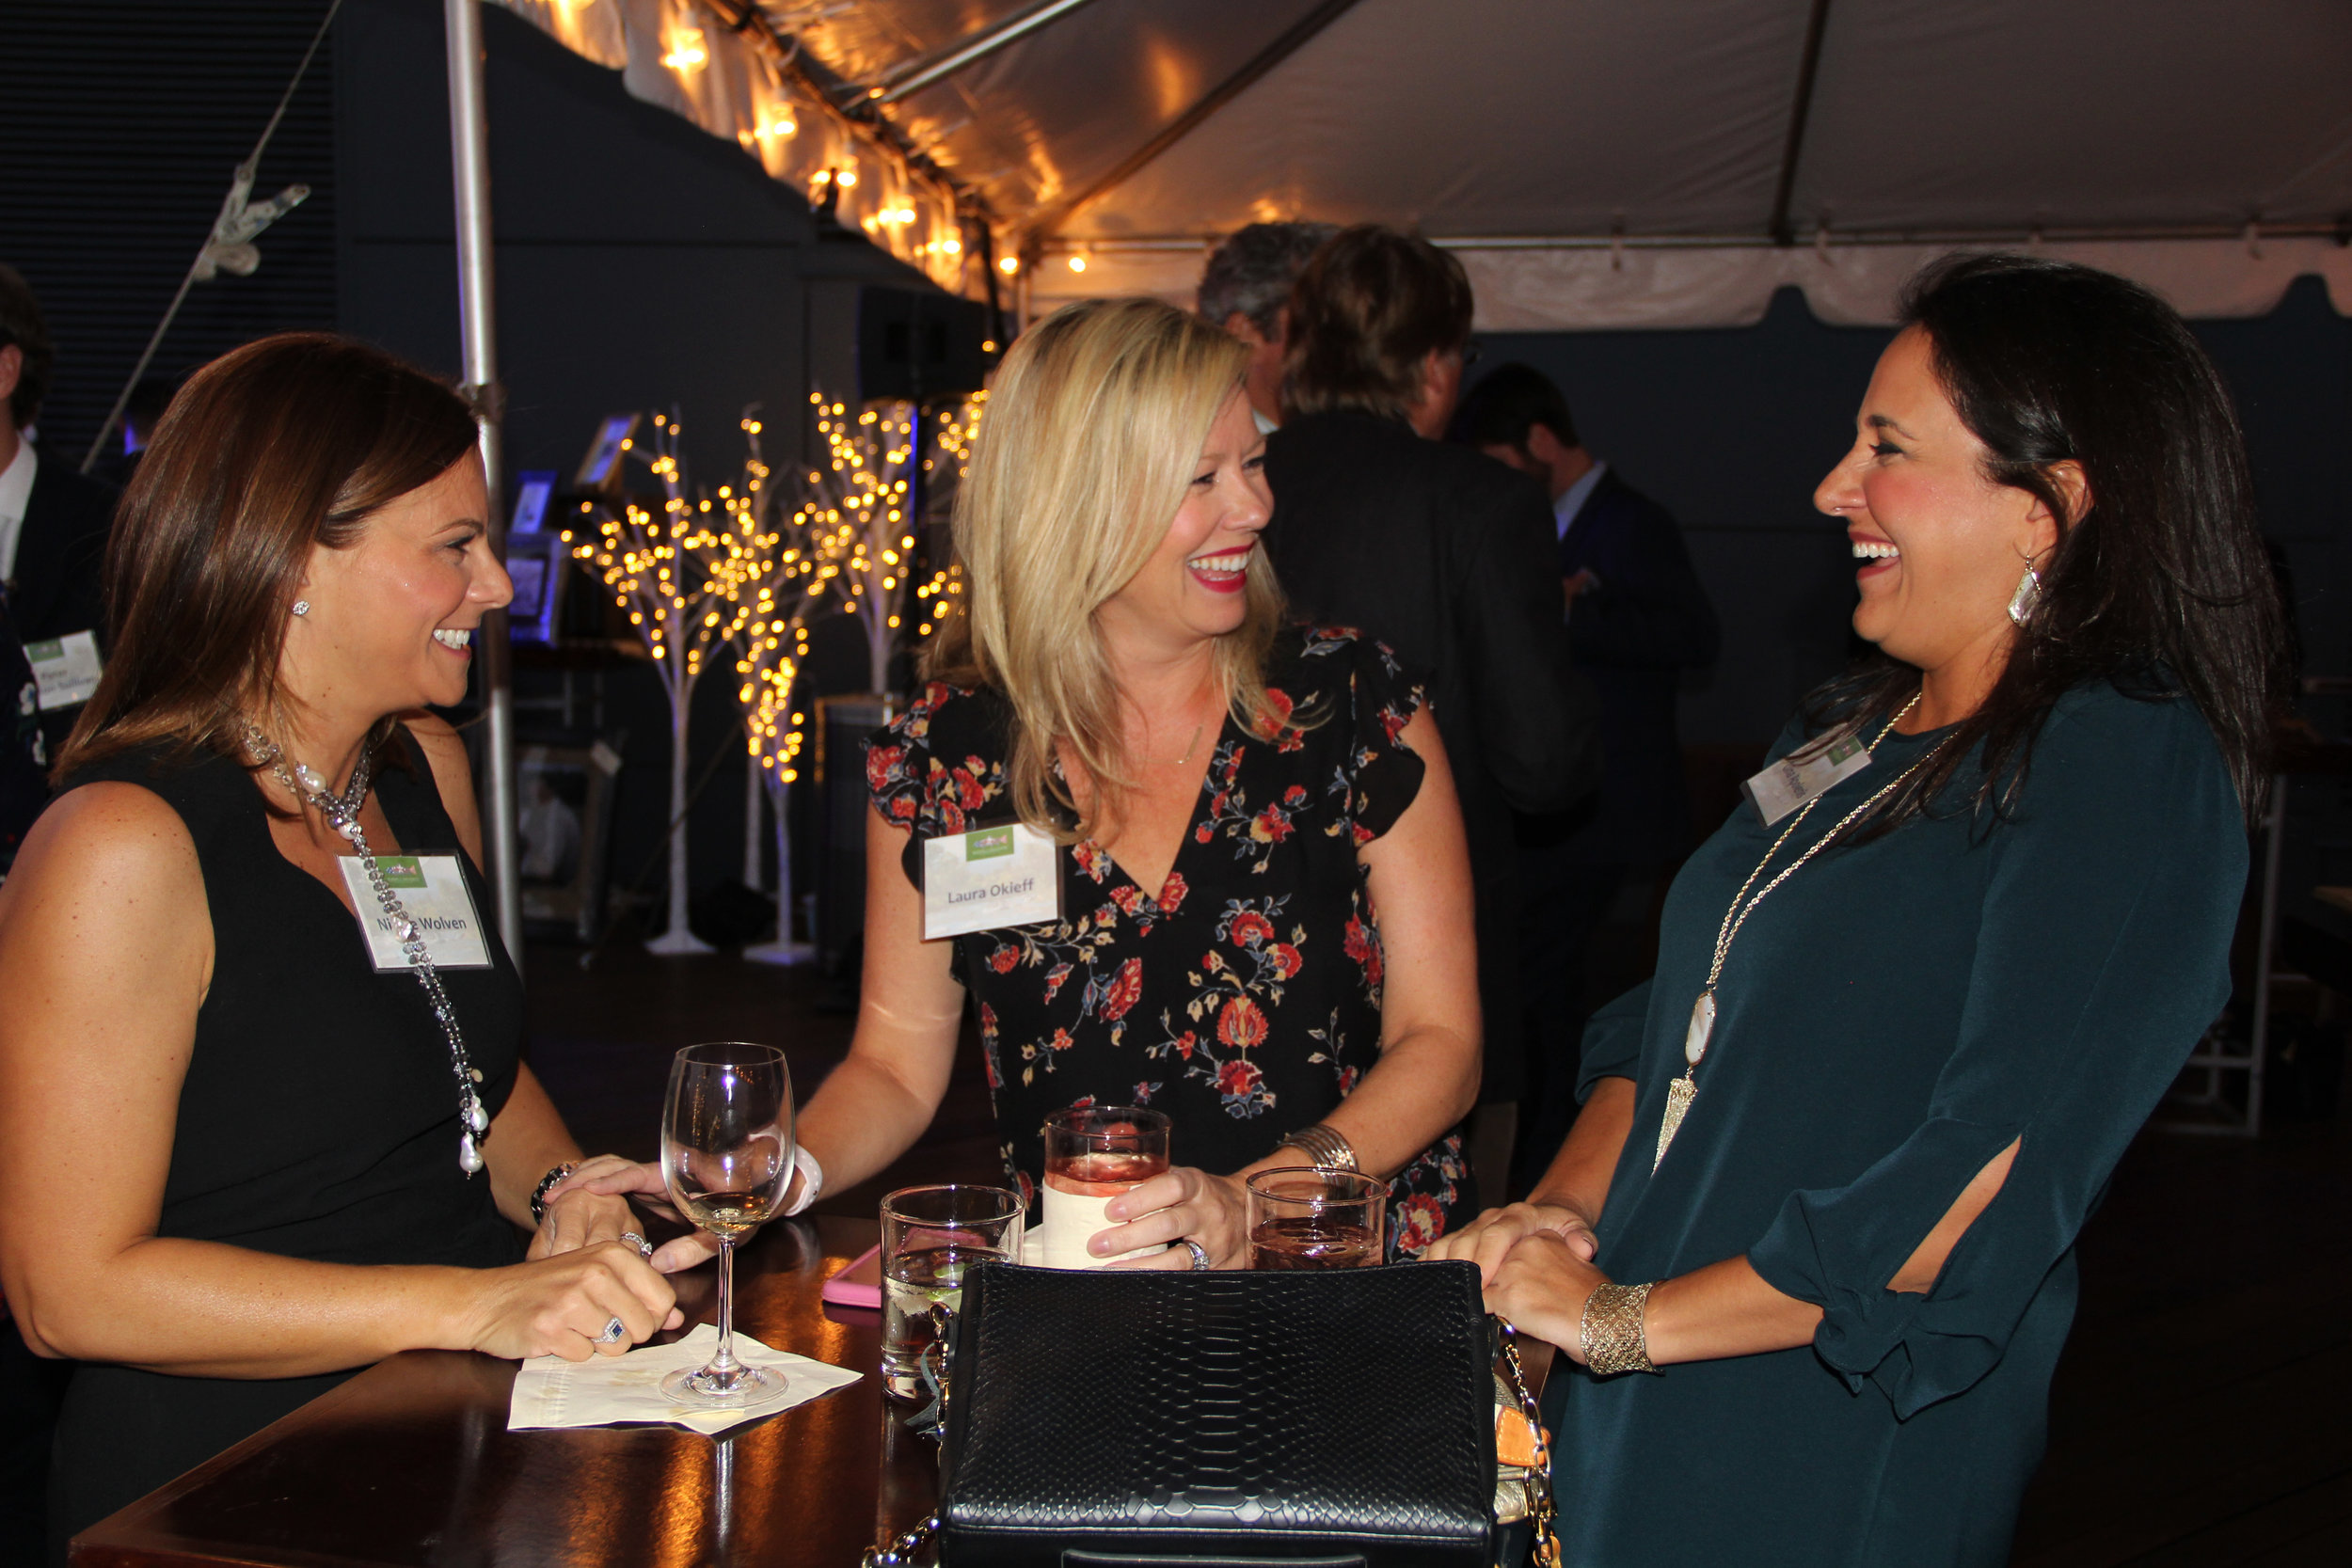 Three women socializing at event